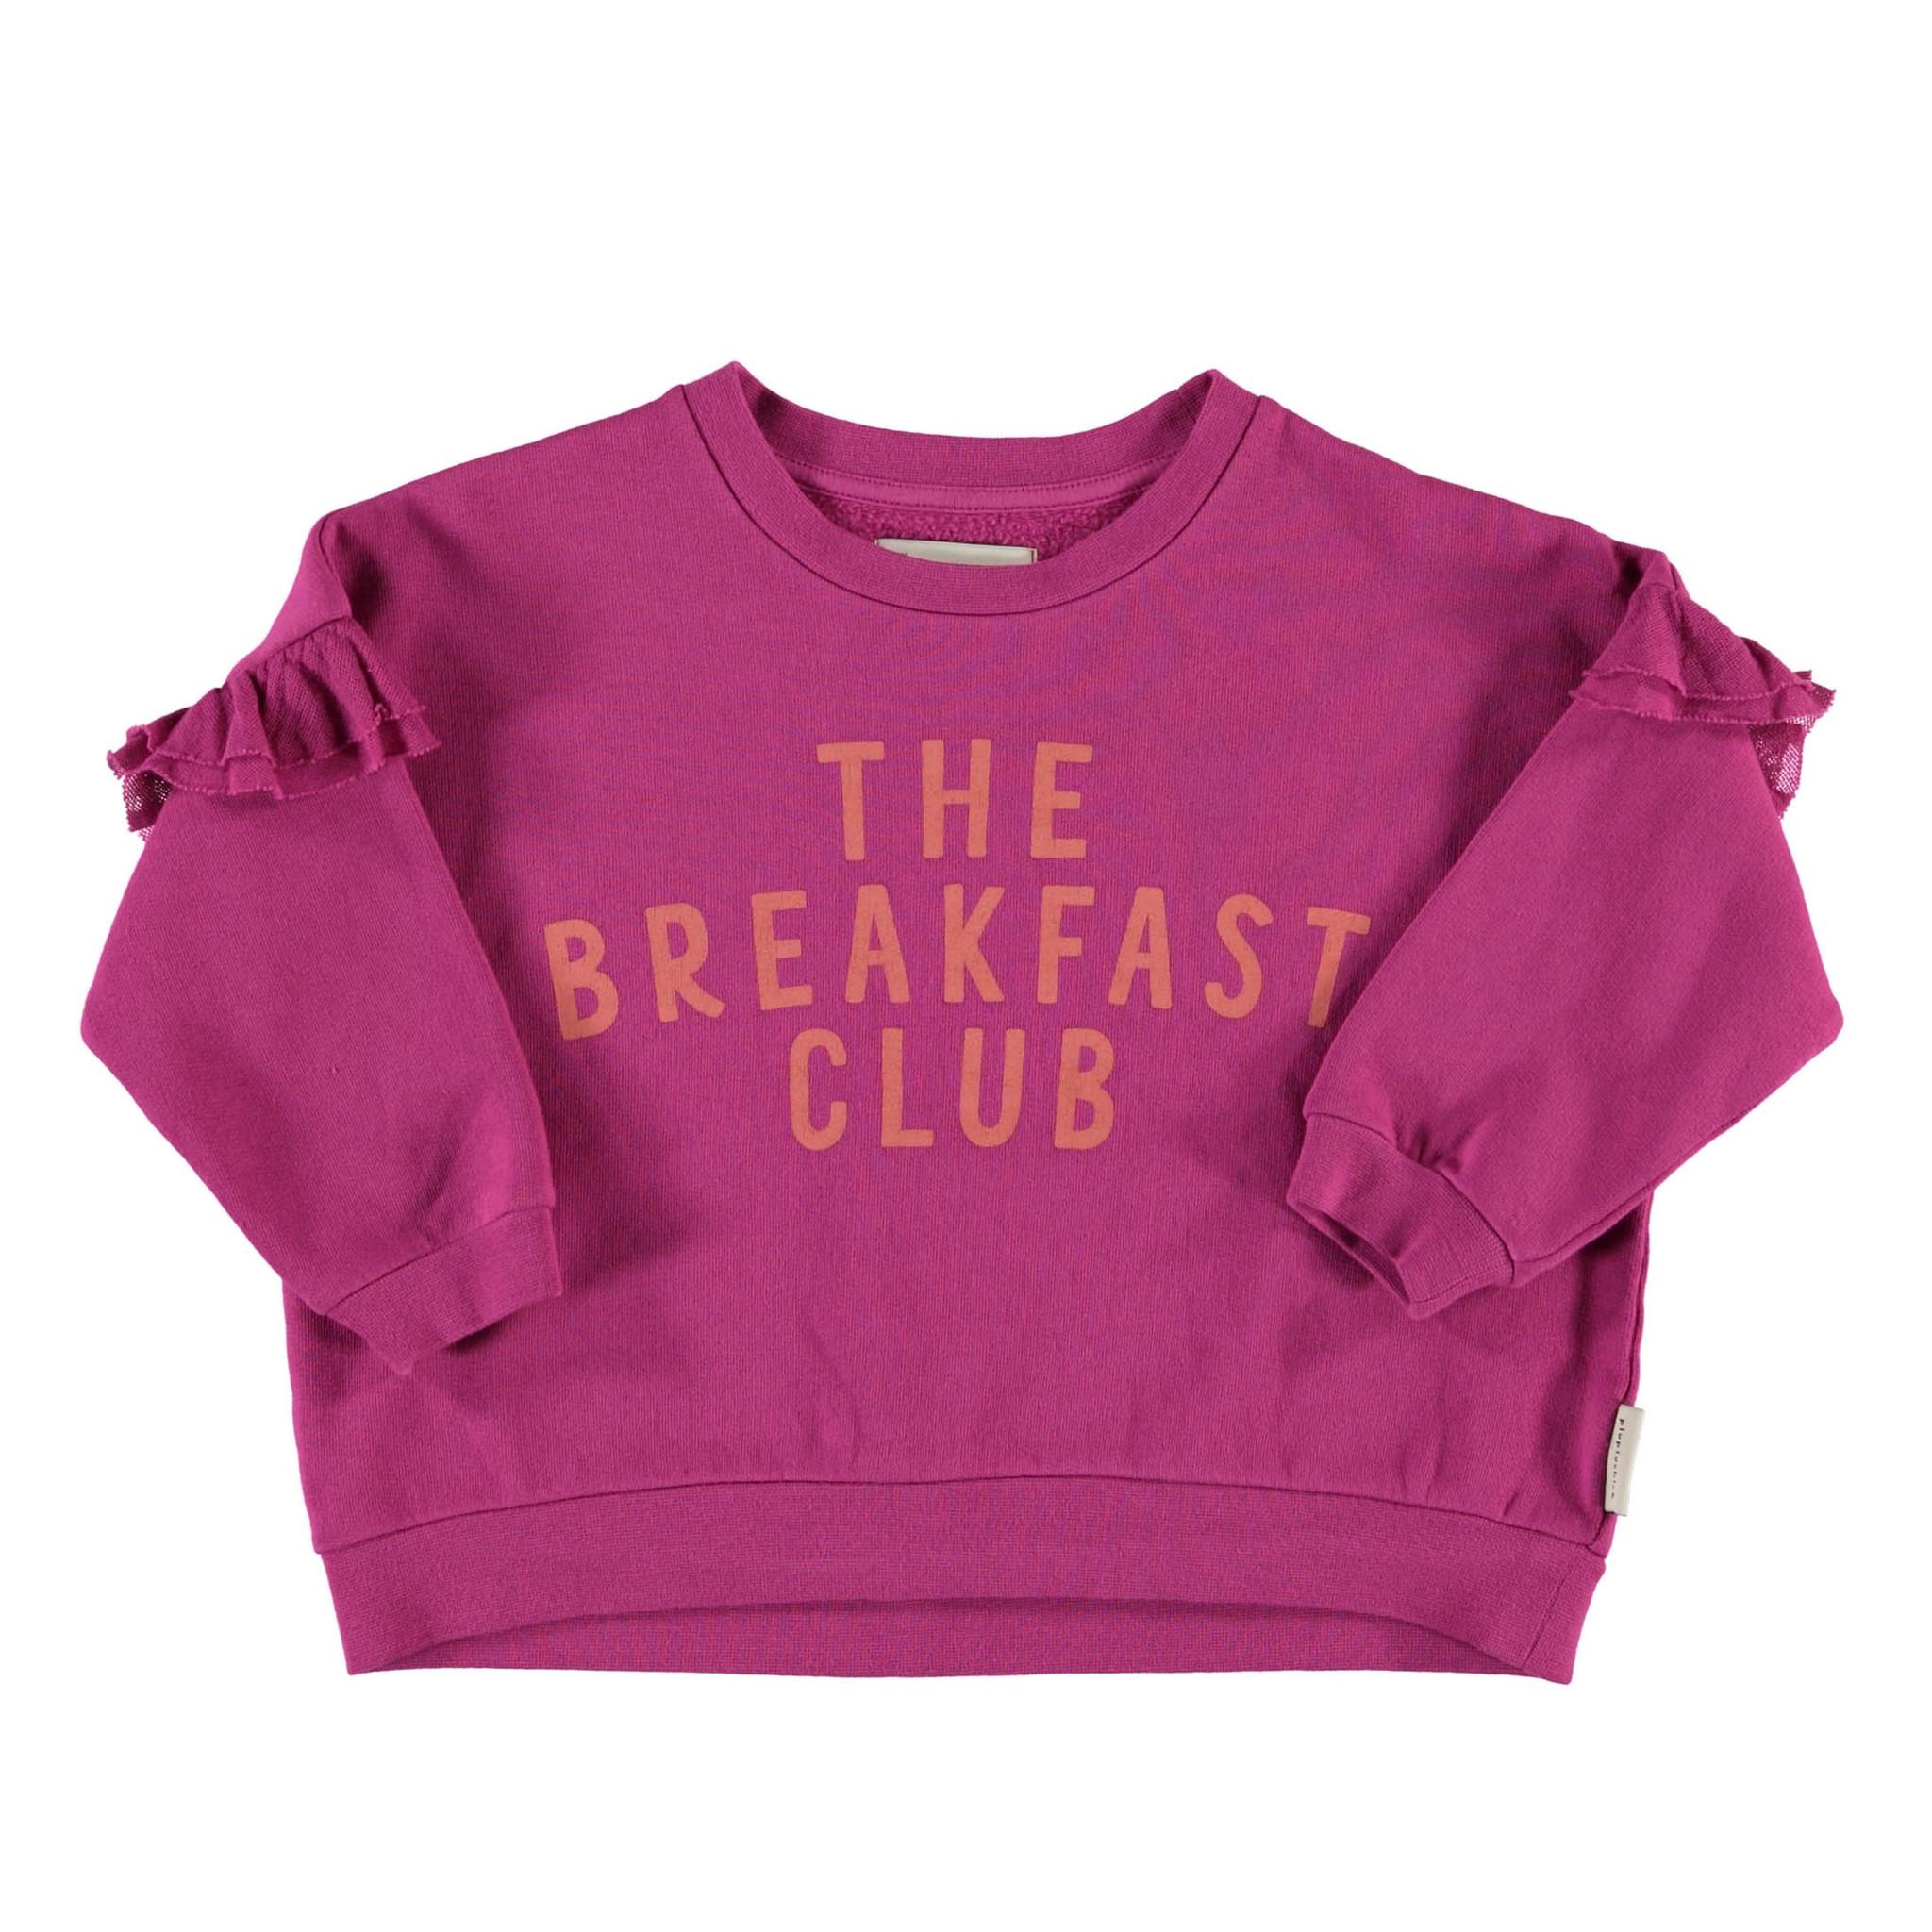 "sweatshirt w/ frills on shoulders | fuchsia w/ ""the breakfast club"" print-1"